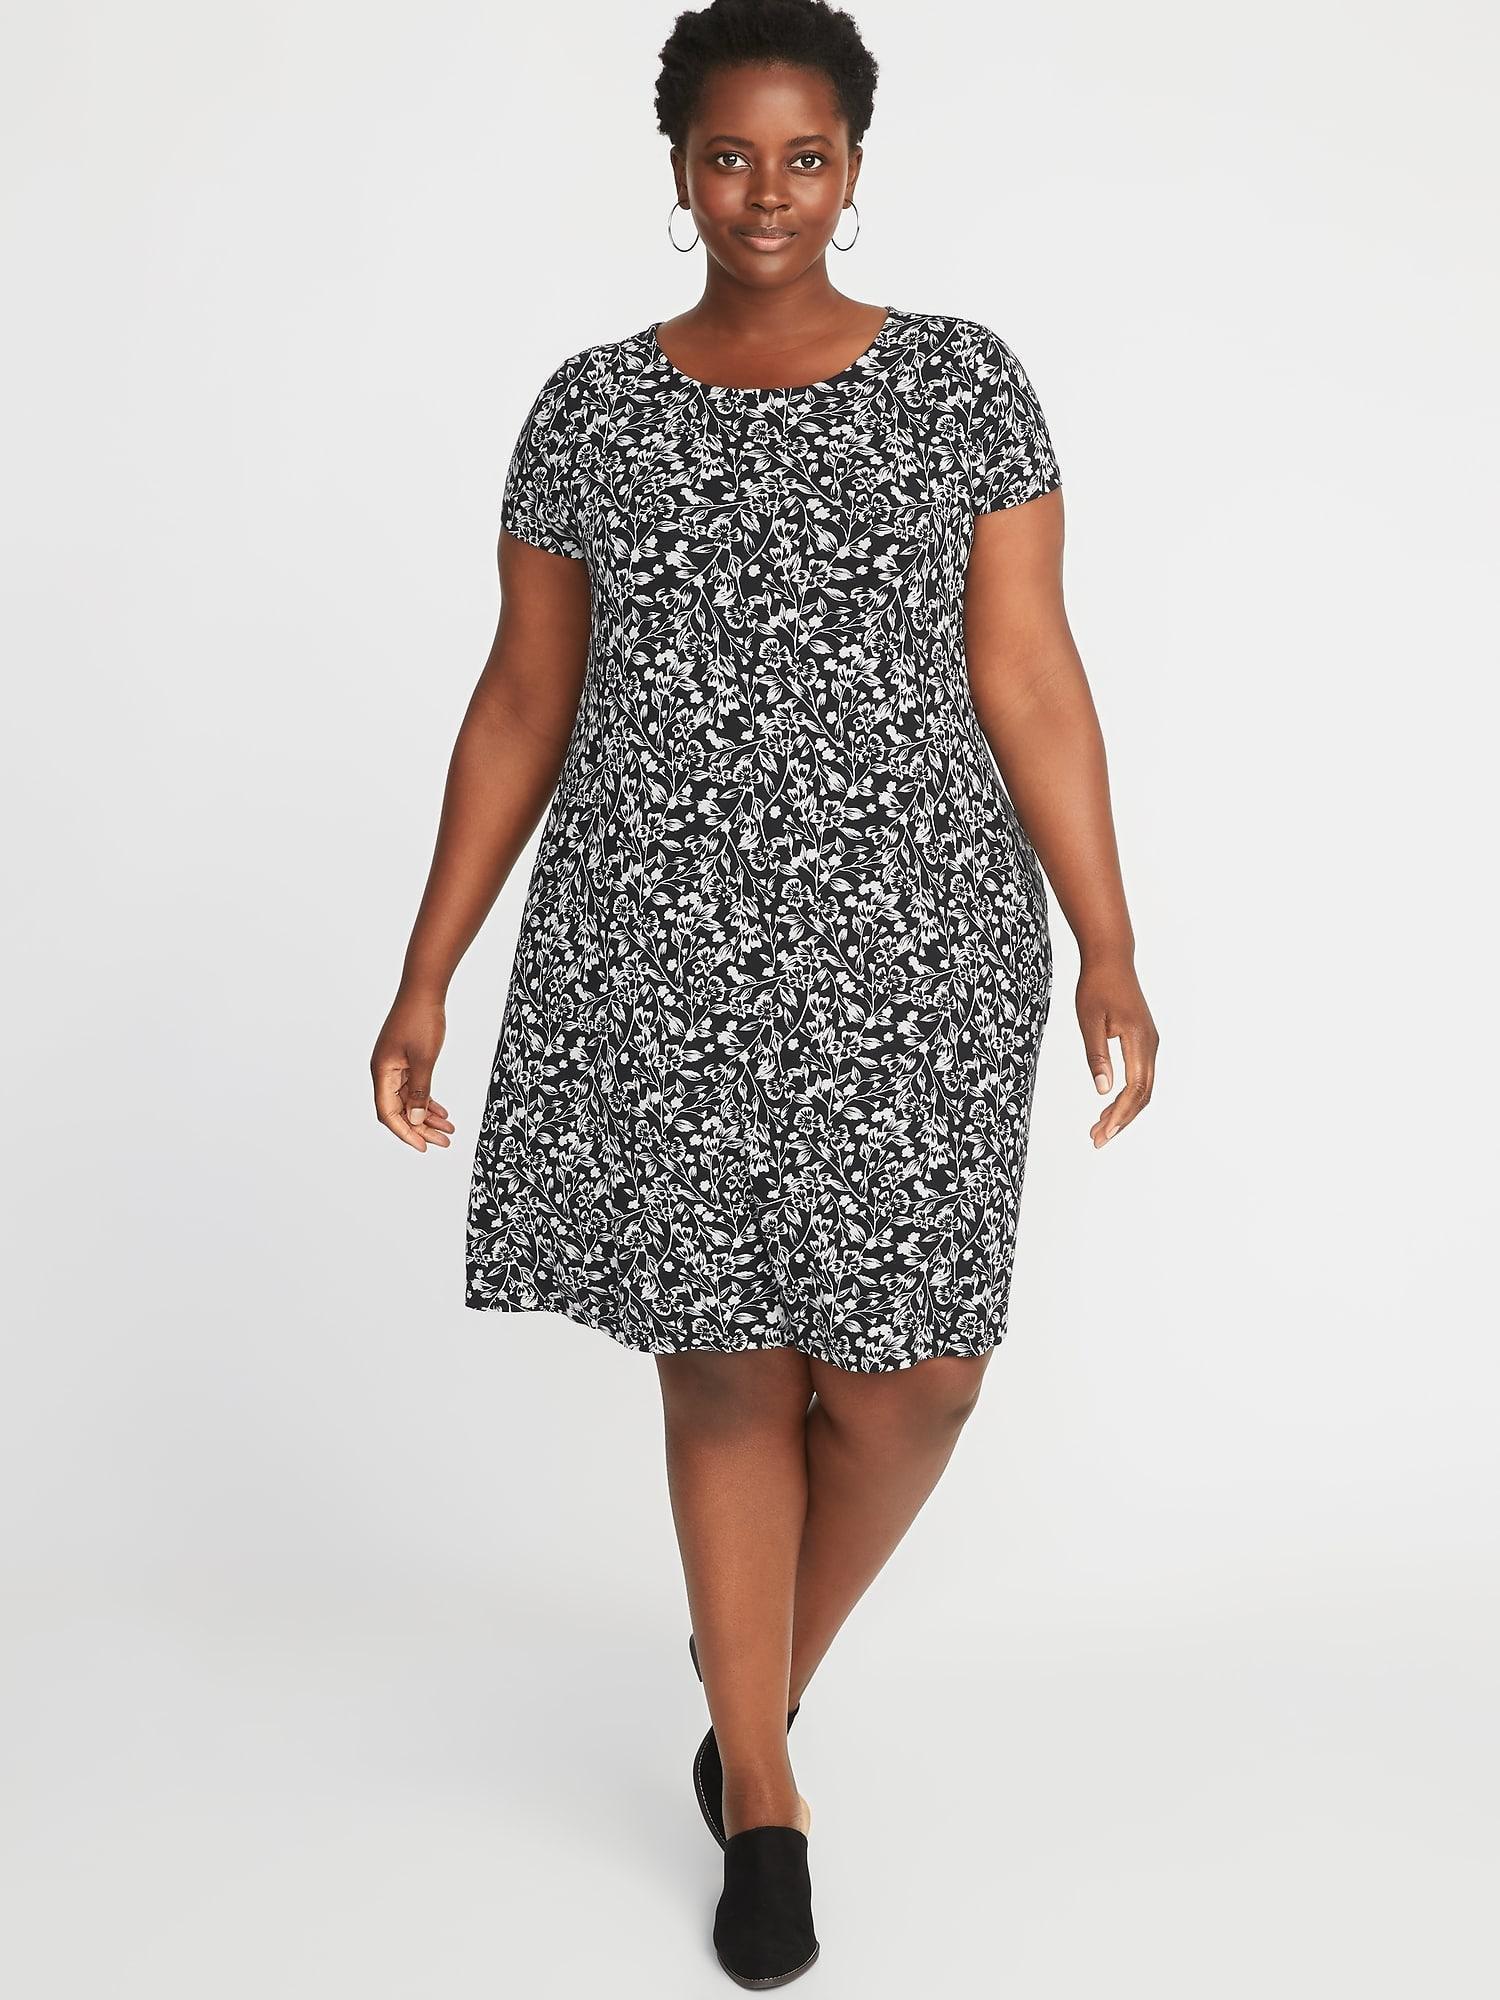 3d7f6bf4cf37 Old Navy Black Short Sleeve Dress - PostParc